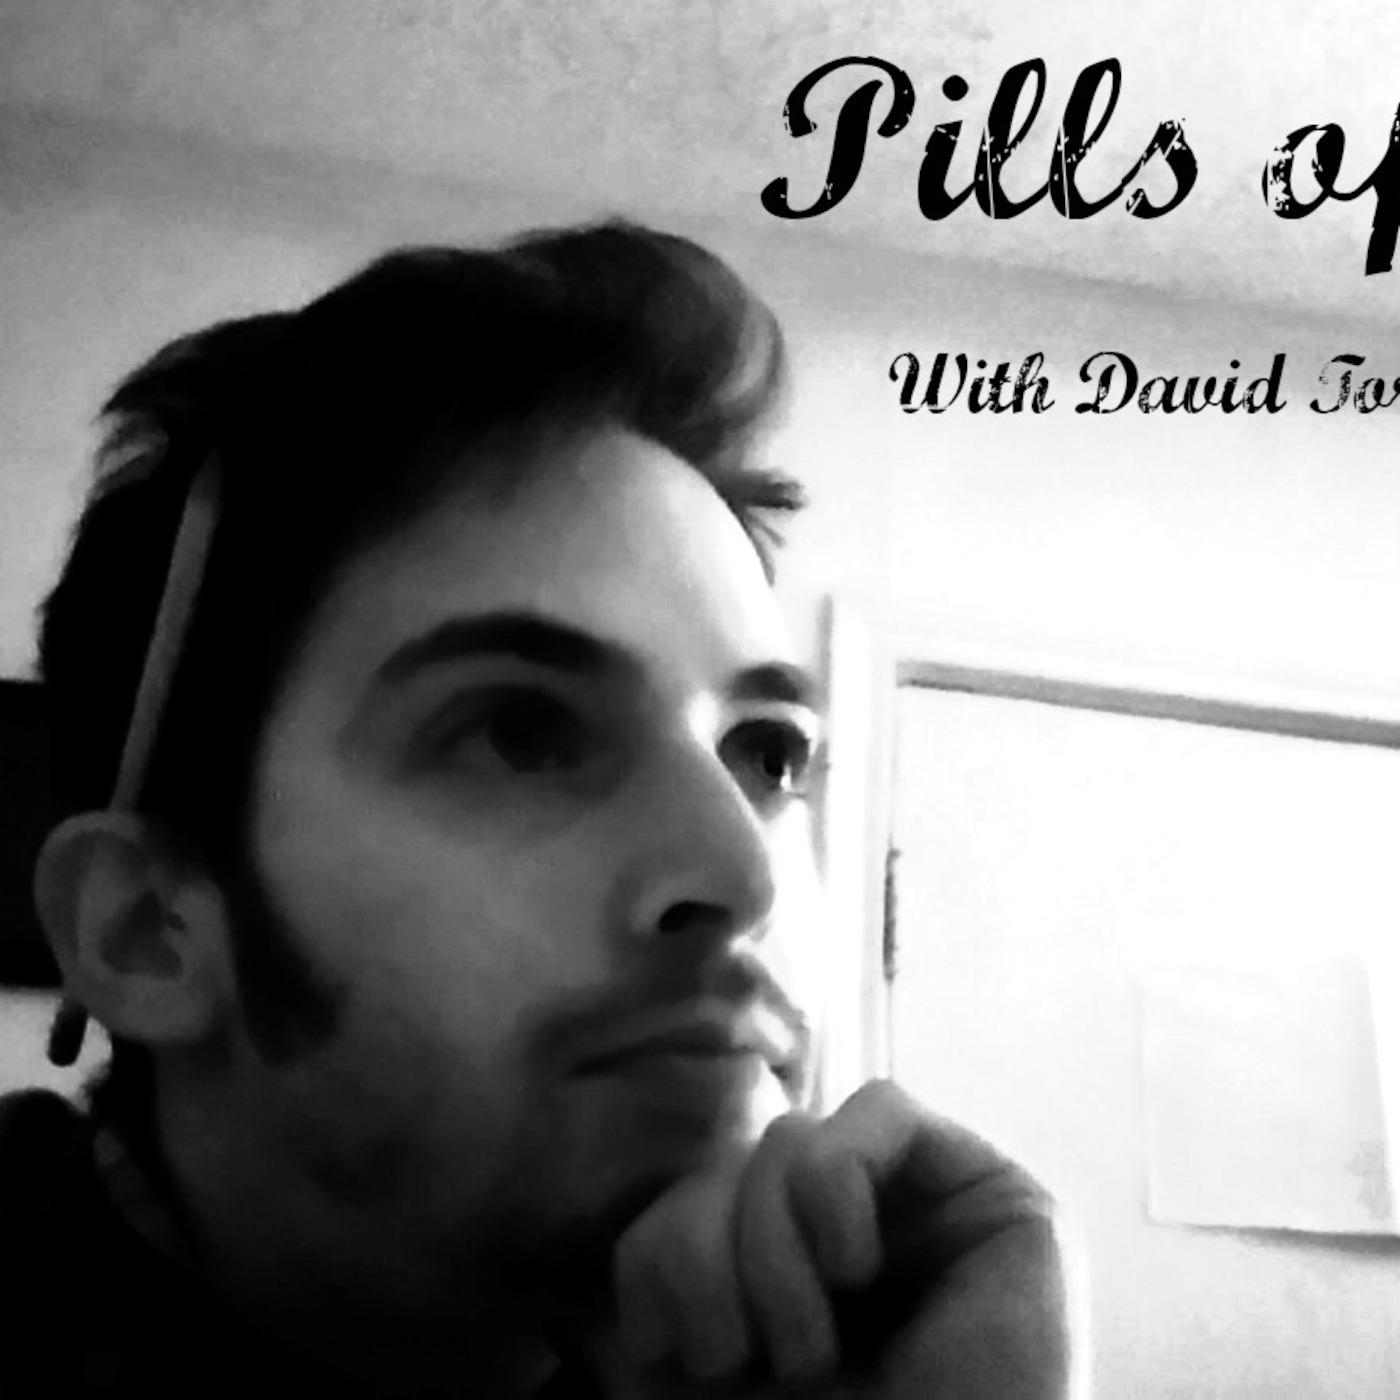 Pills of life...